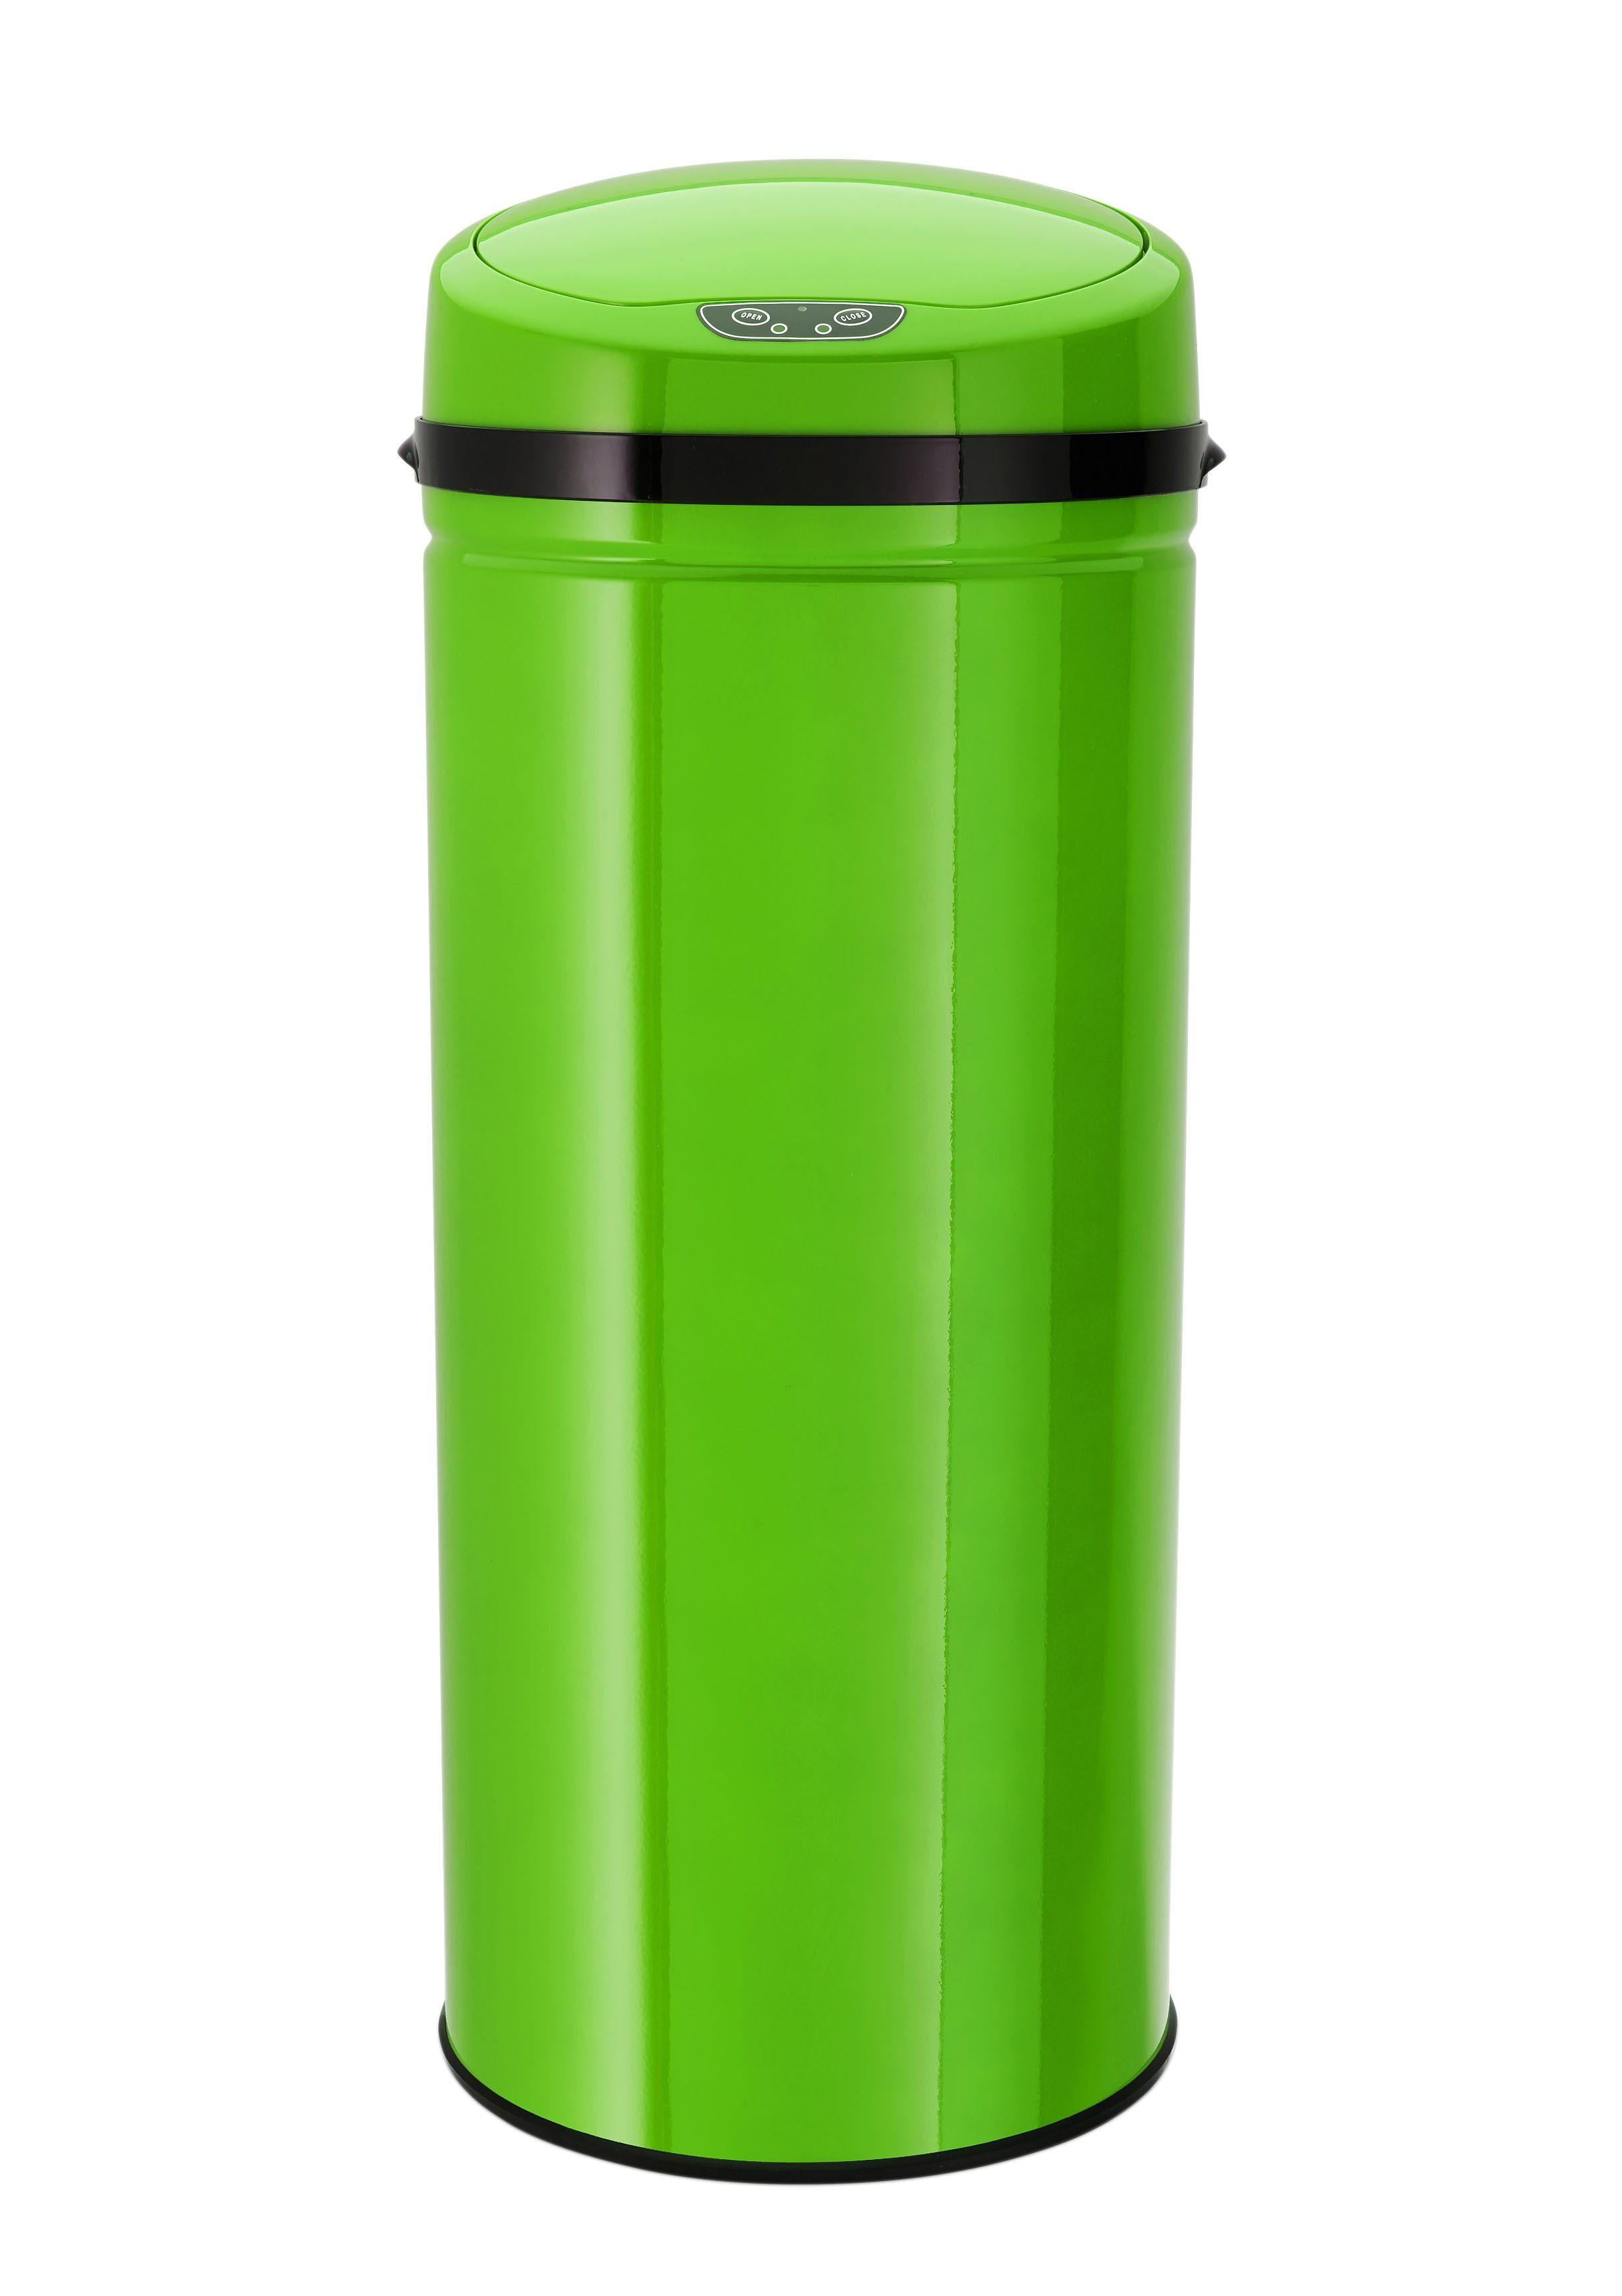 Edelstahl-Abfalleimer mit Infrarotsensor, 42 Liter, »INOX LEMON«, Echtwerk